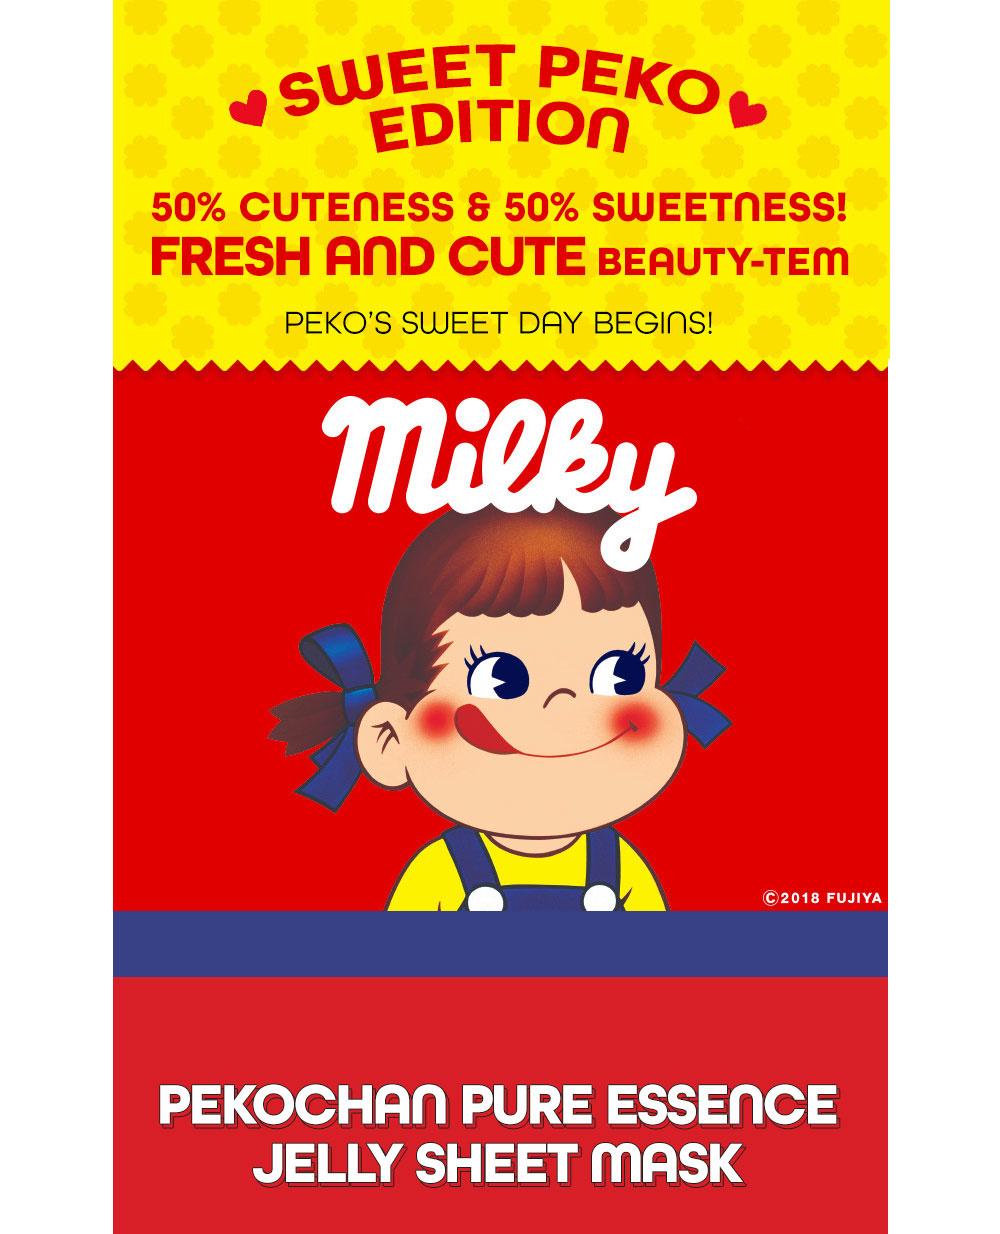 Jelly Mask Sheet Lemon (Sweet Peko Limited Edition)-2